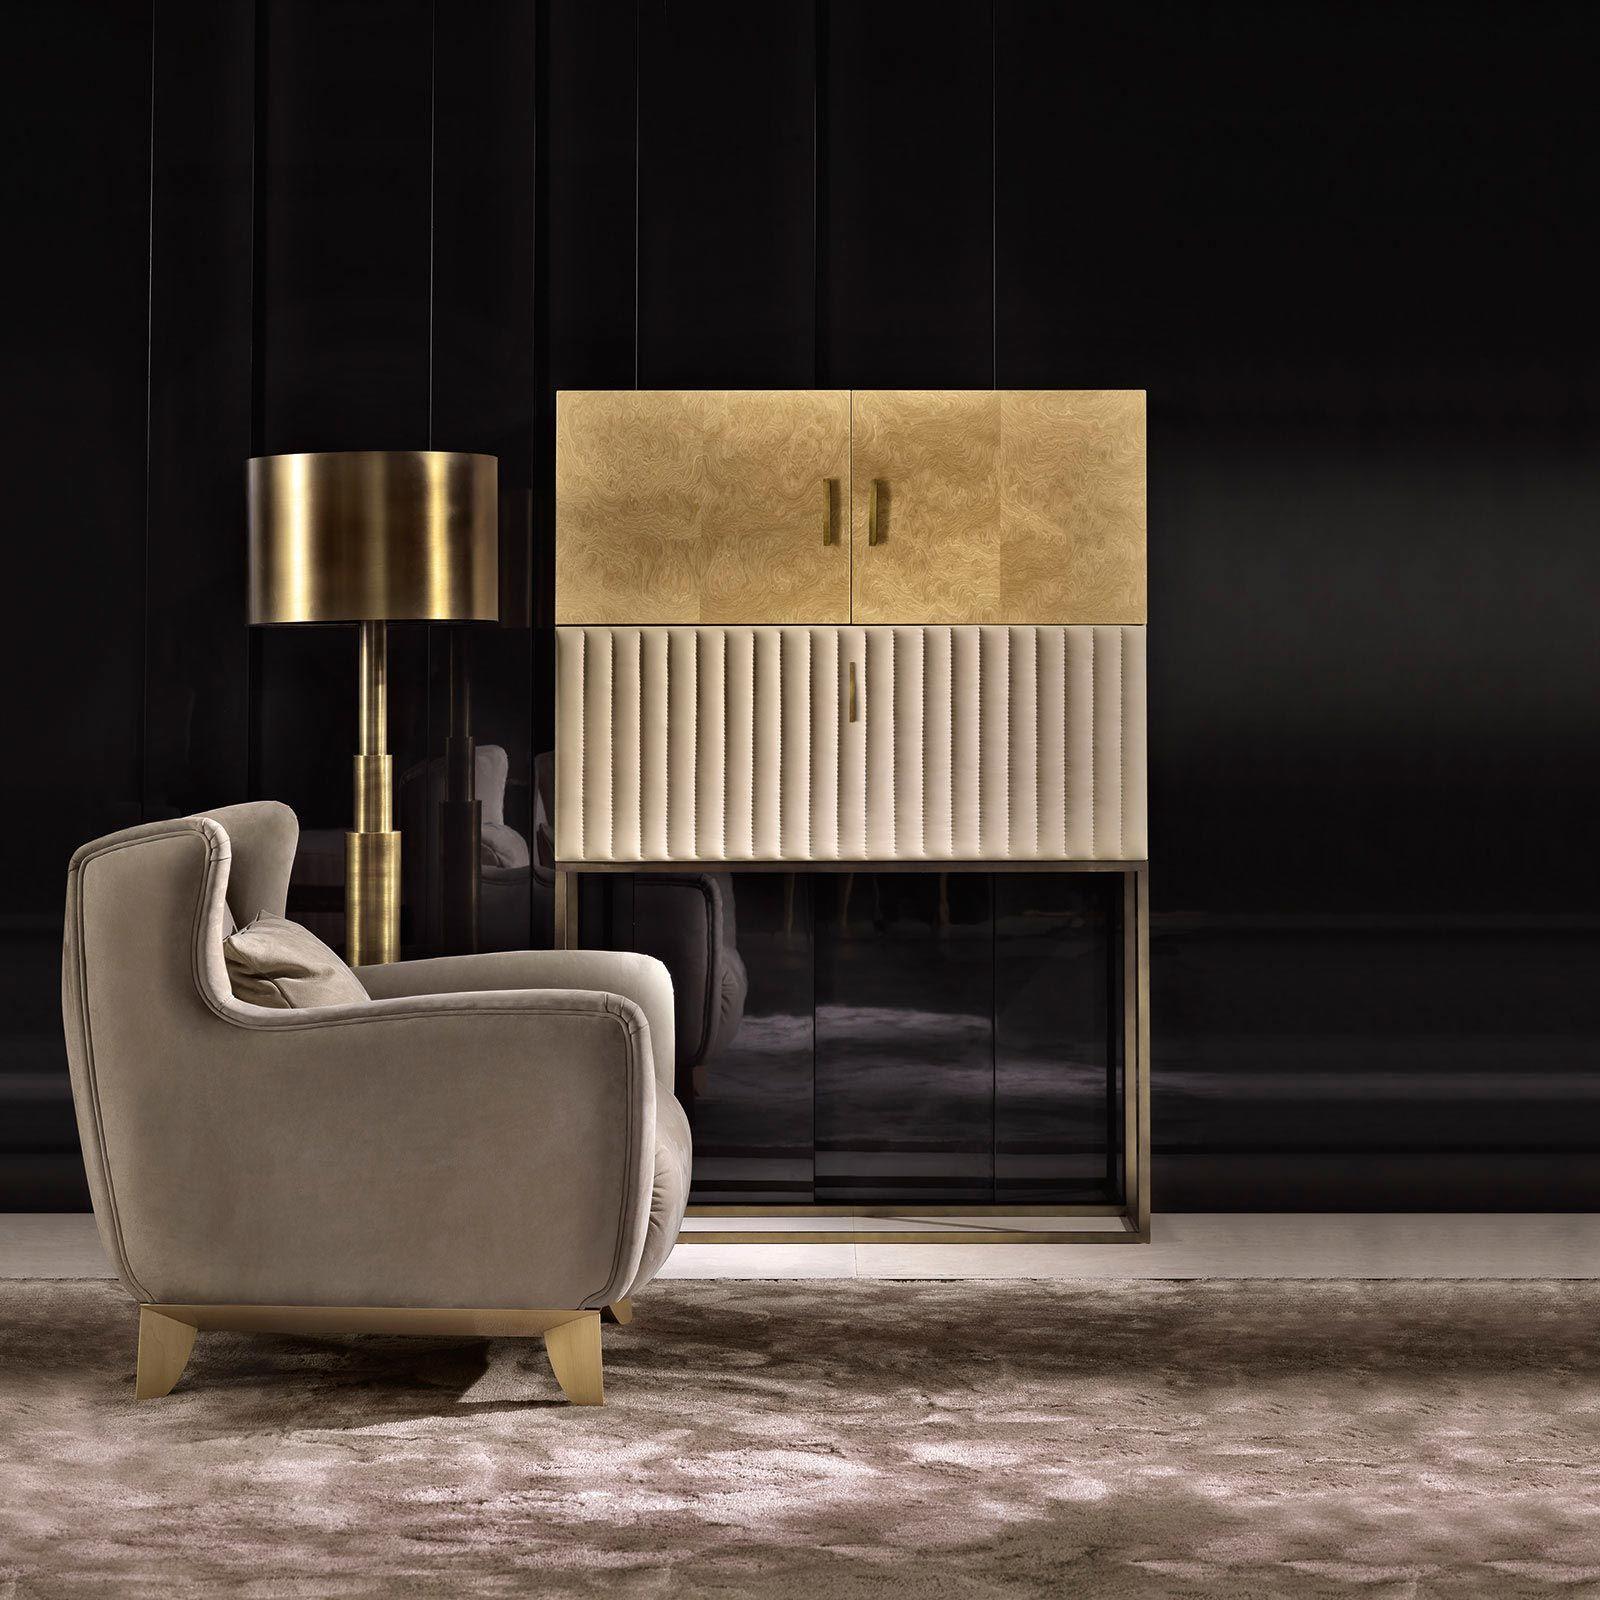 Daytona arredamento contemporaneo moderno di lusso arredo - Art deco mobili ...